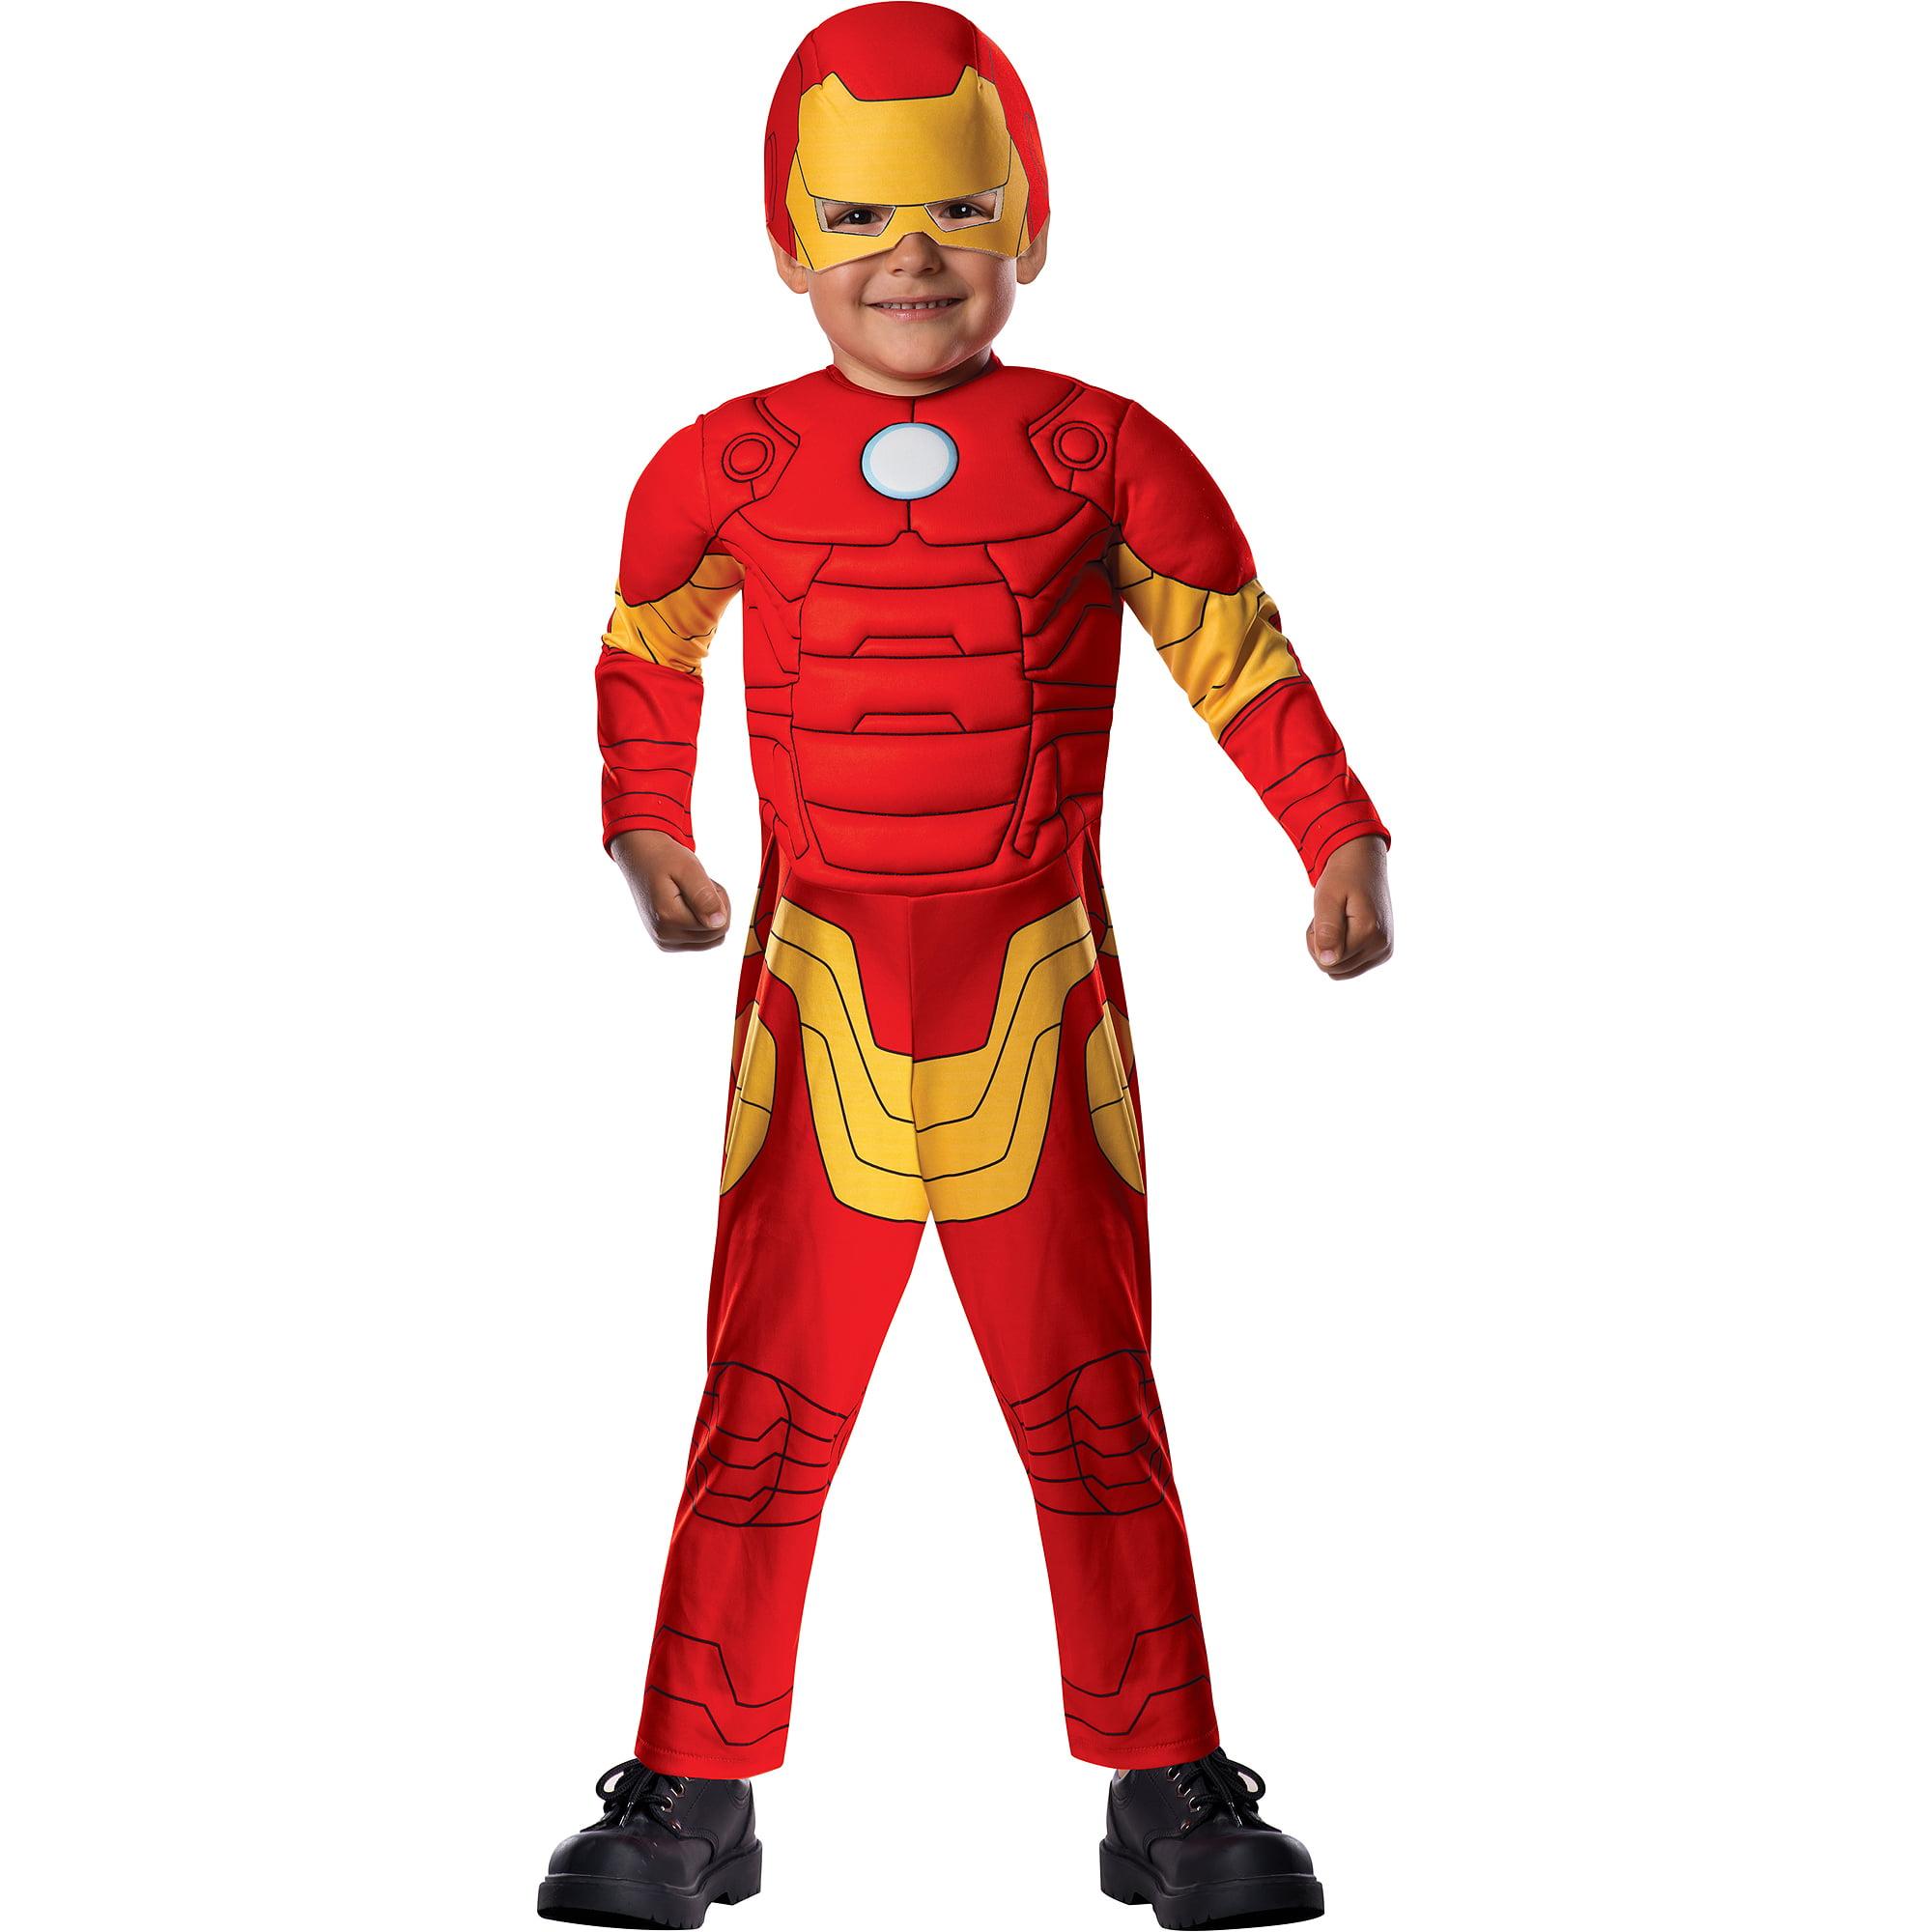 Avengers Iron Man Toddler Halloween Costume